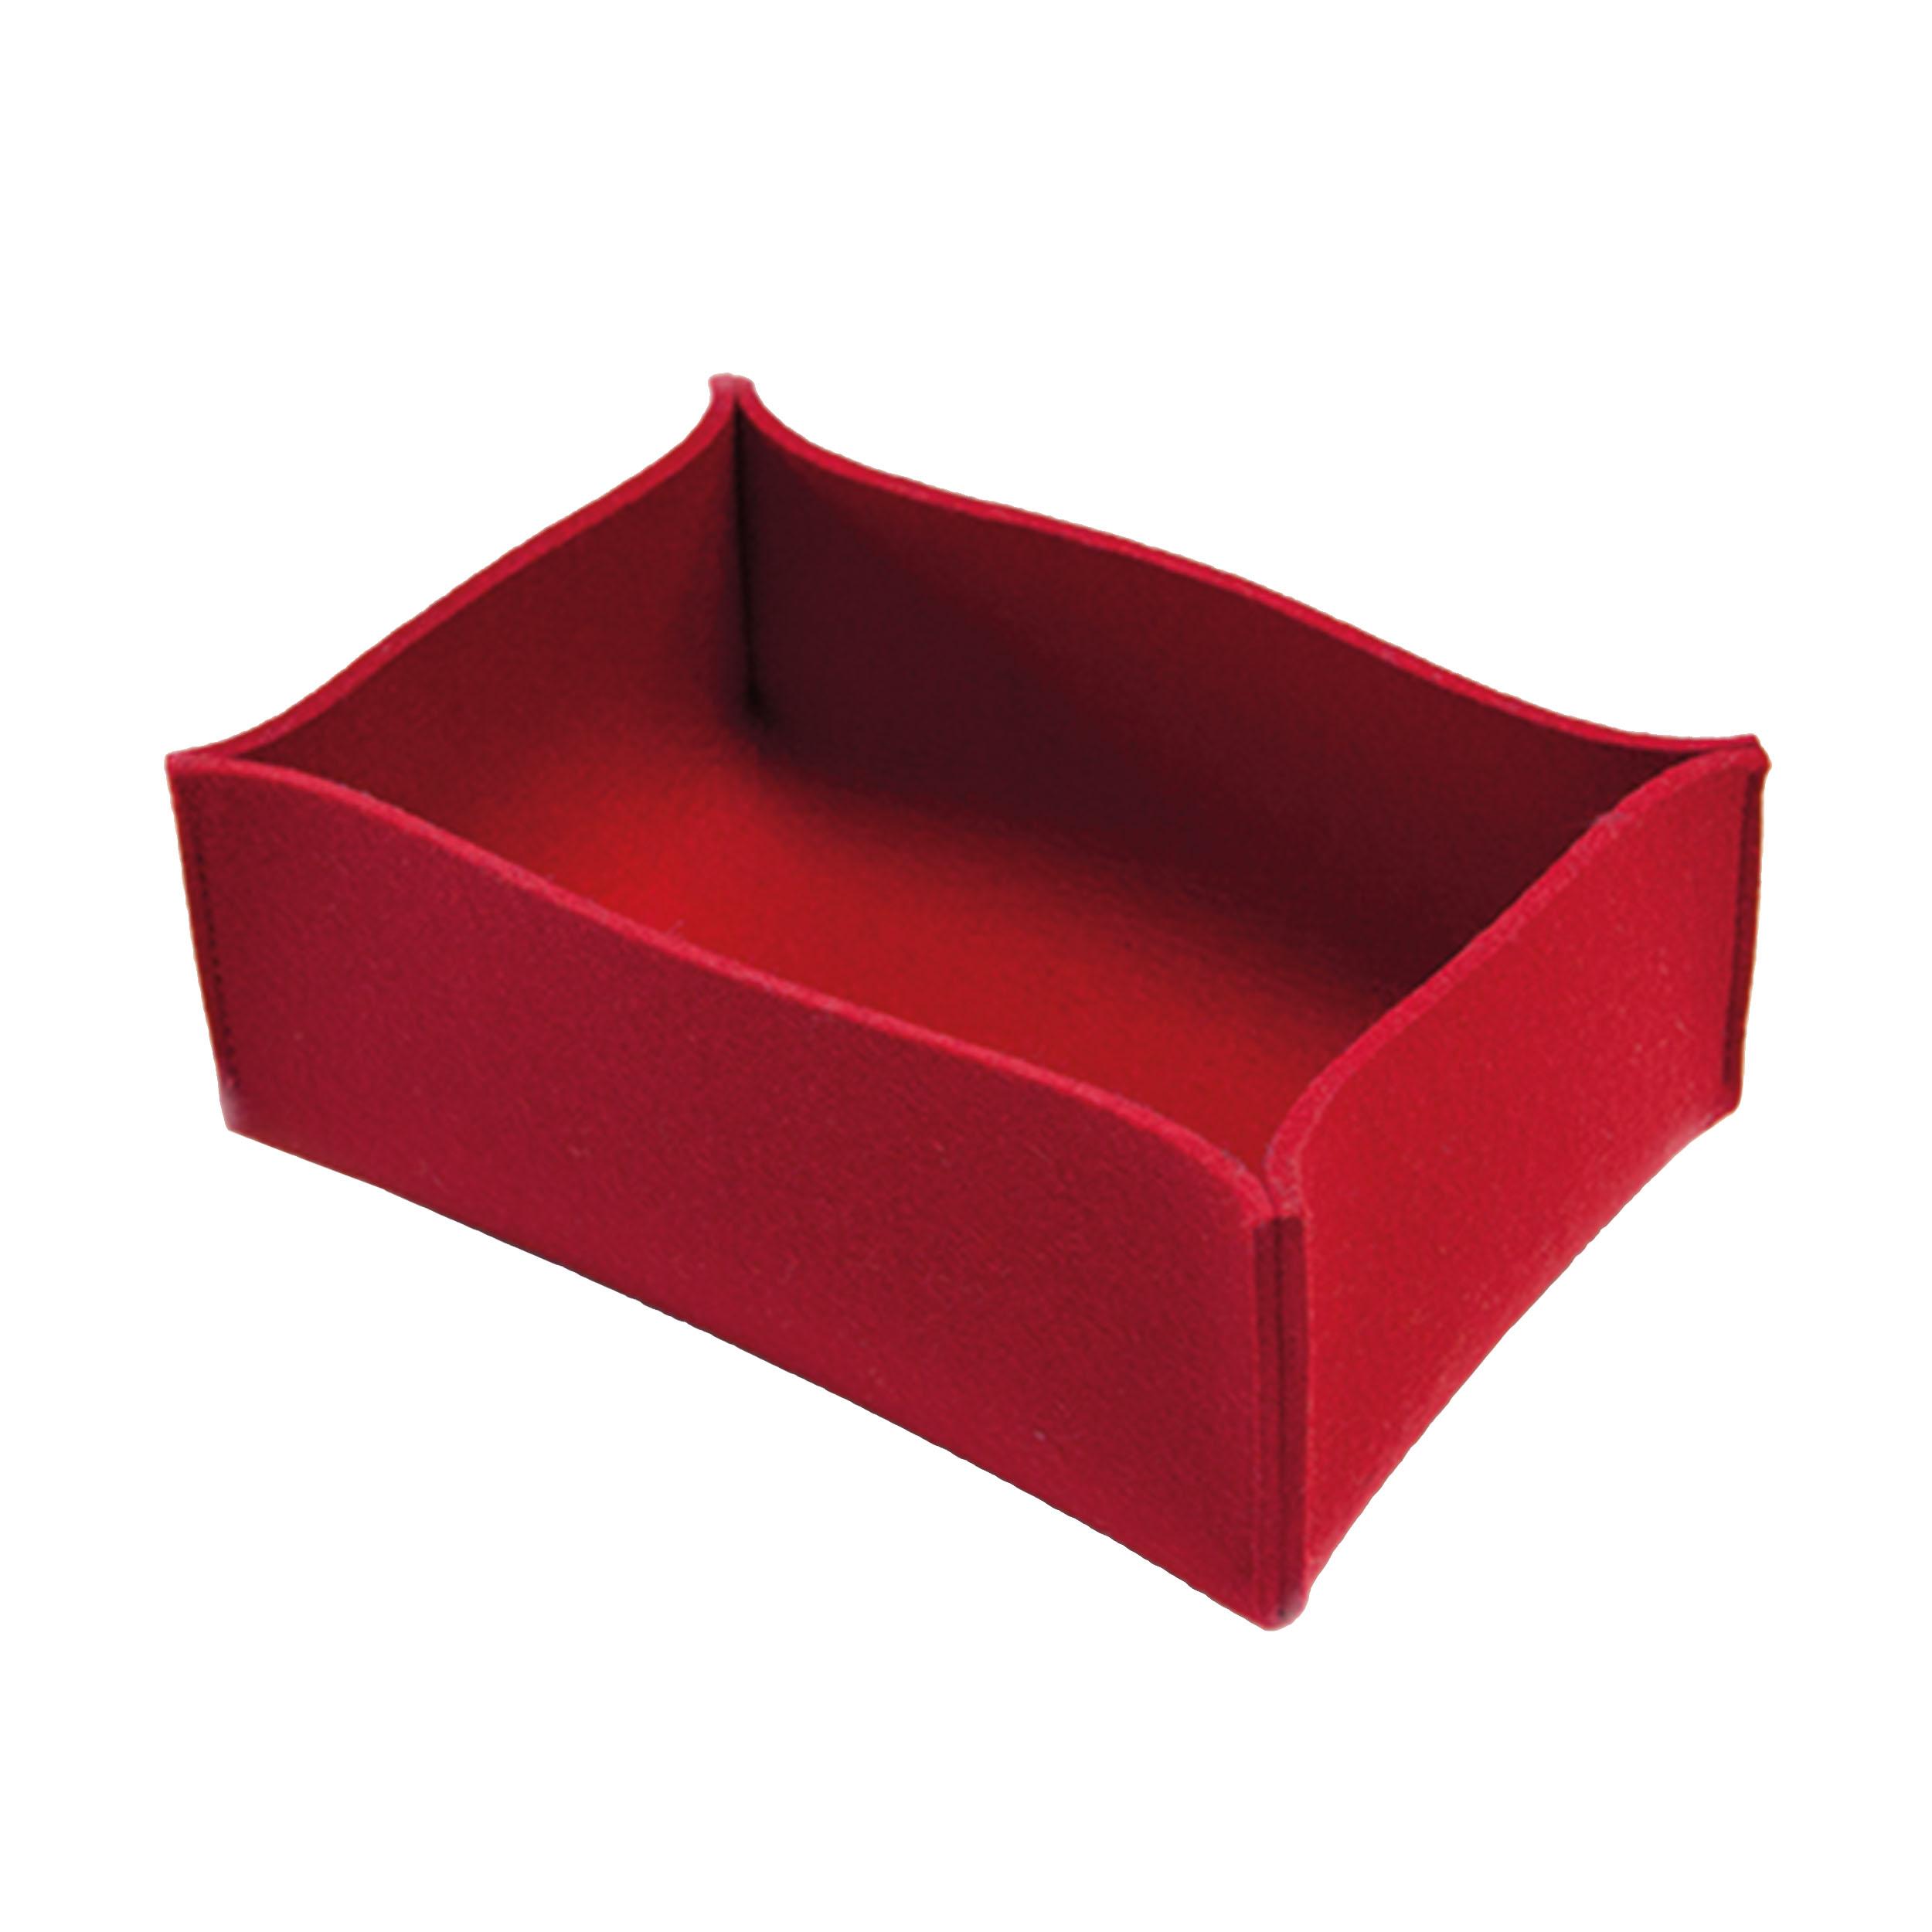 Fire Filzbox